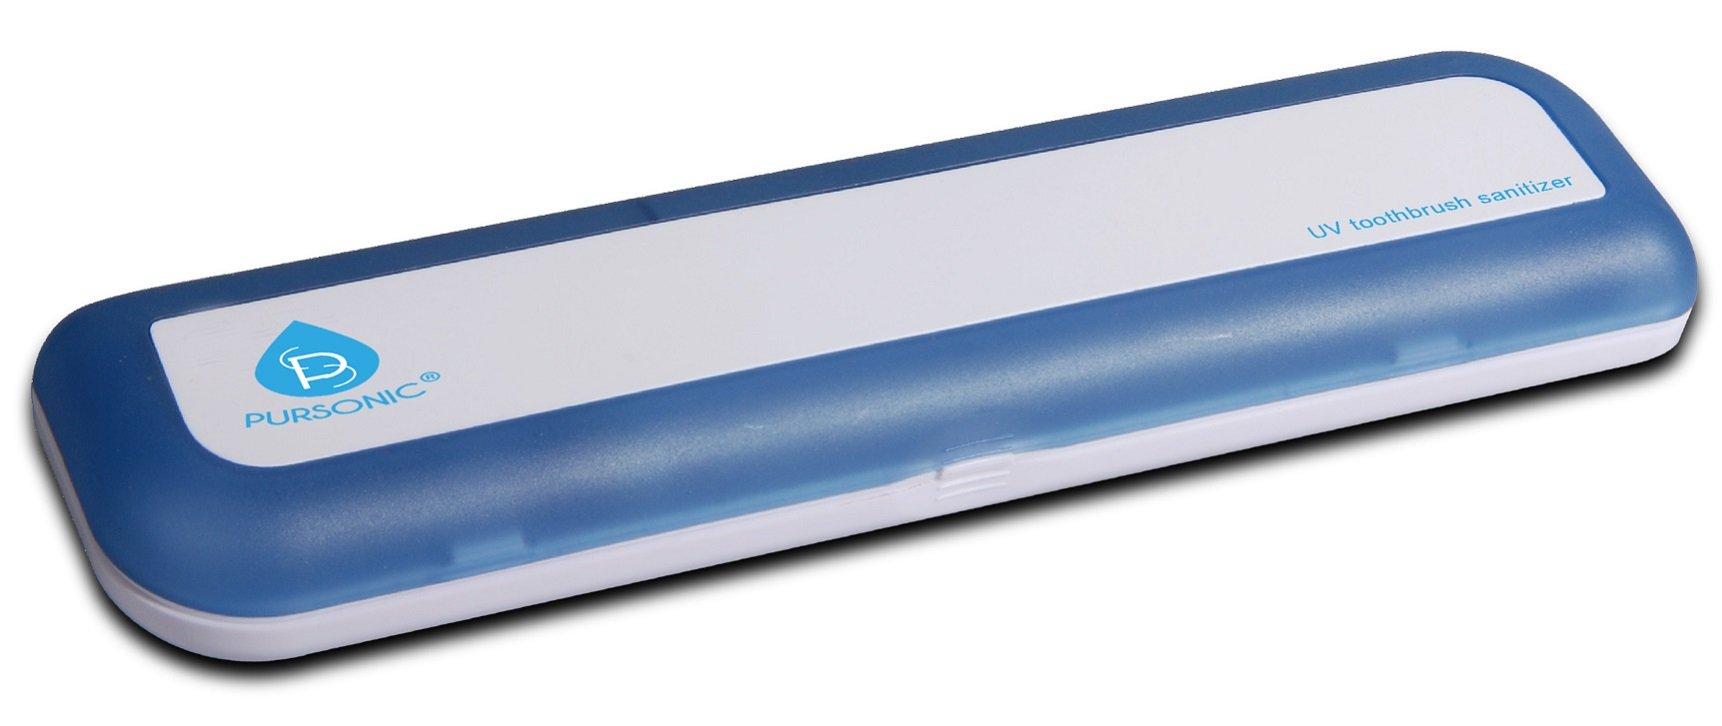 Pursonic S1 Portable UV Toothbrush Sanitizer